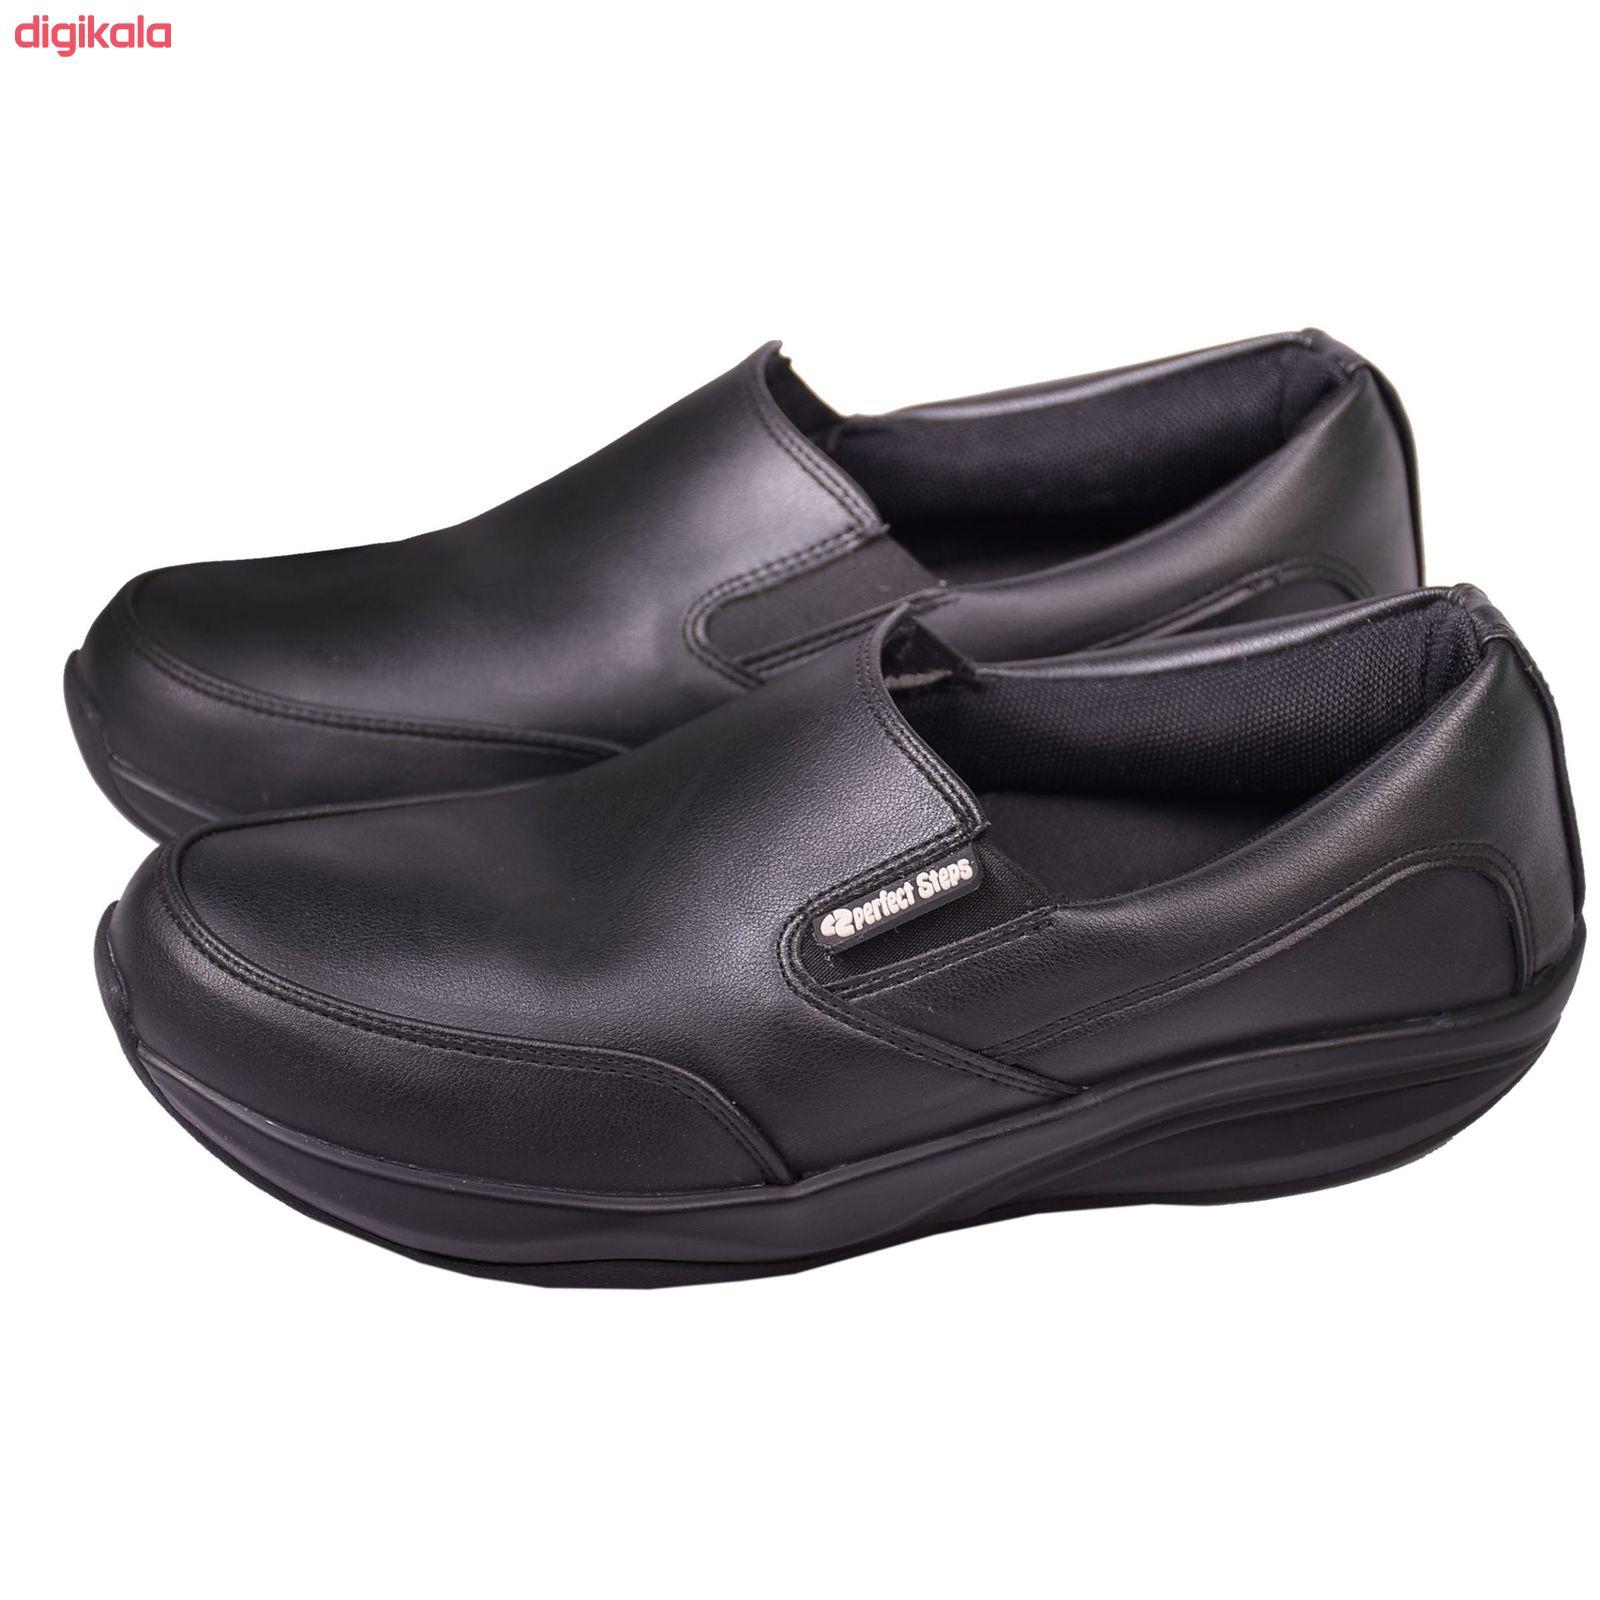 کفش مخصوص پیاده روی زنانه پرفکت استپس مدل پریمو کژوال رنگ مشکی main 1 5